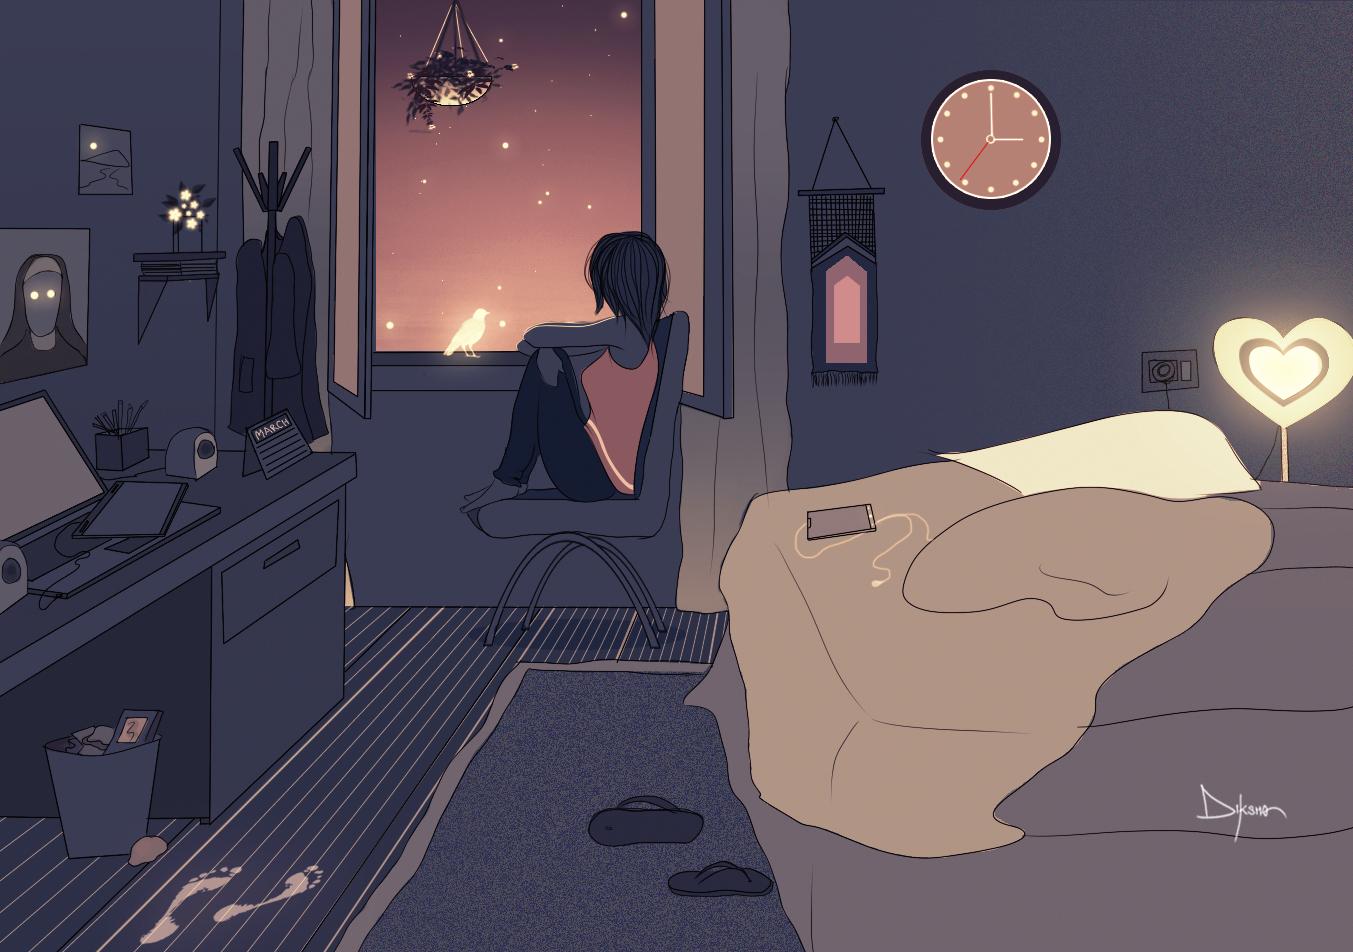 Twilight by Diksha13